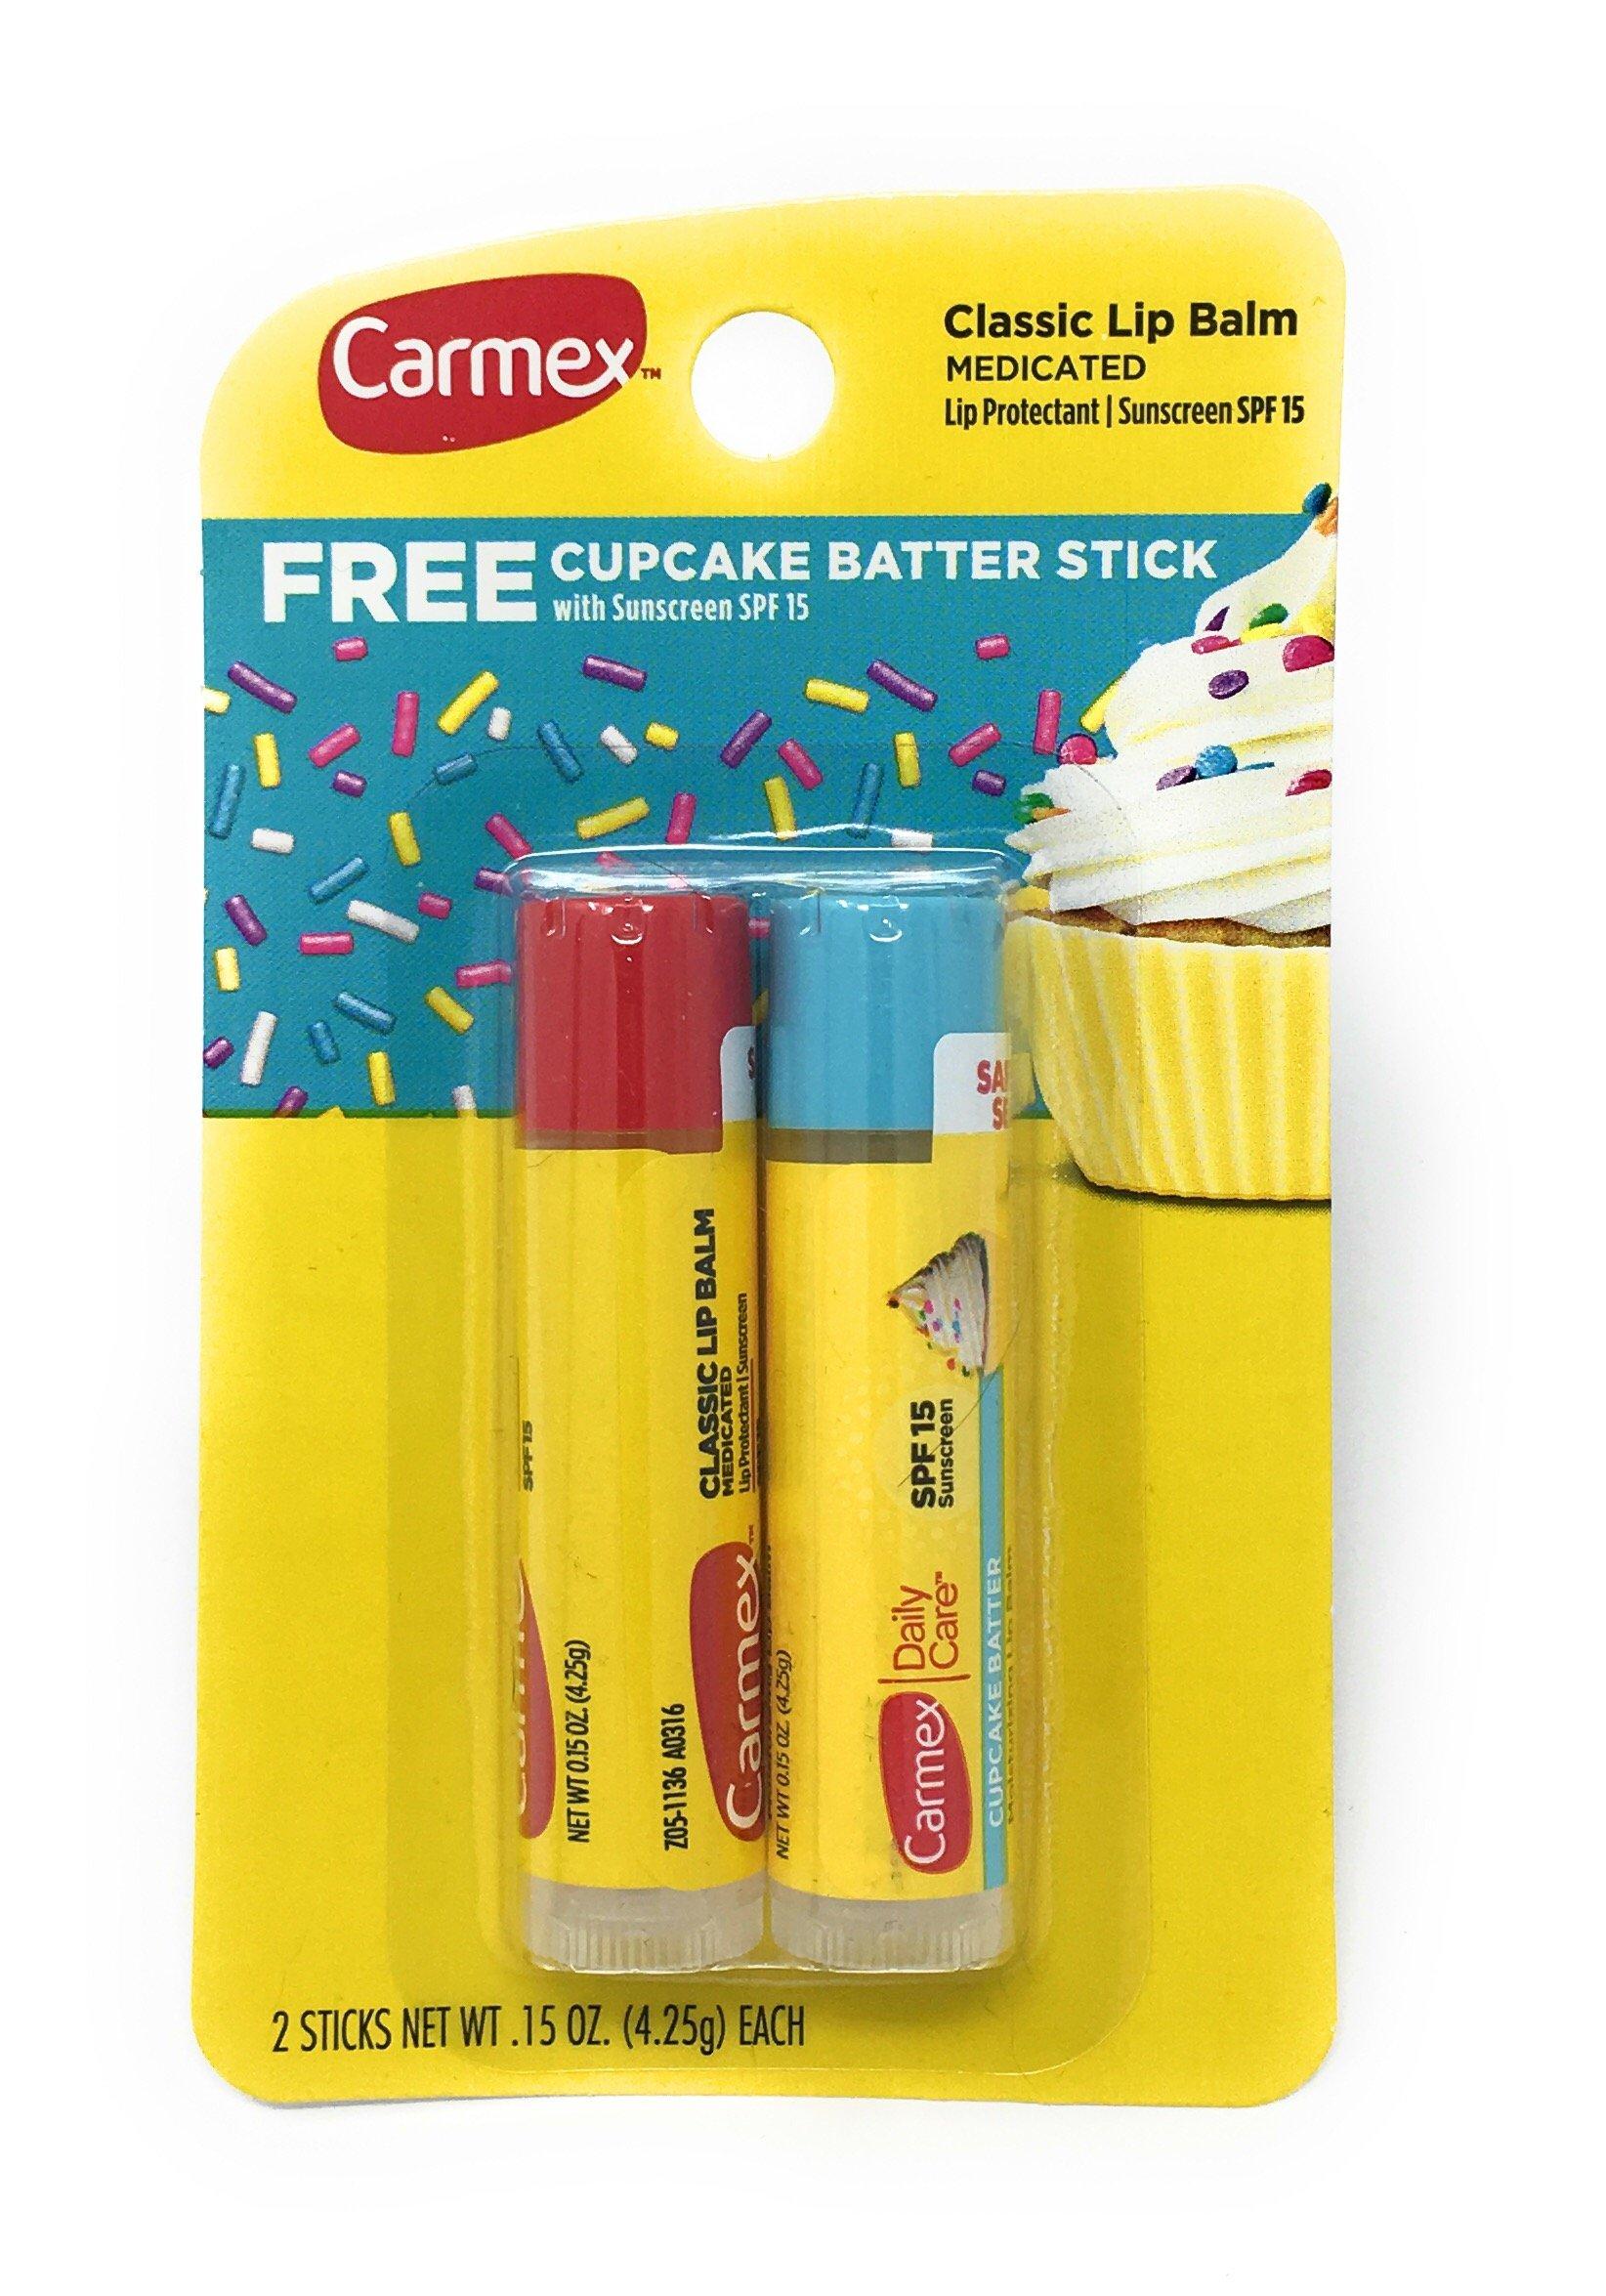 Carmex Classic Medicated Lip Balm Stick with FREE Cupcake Batter Stick